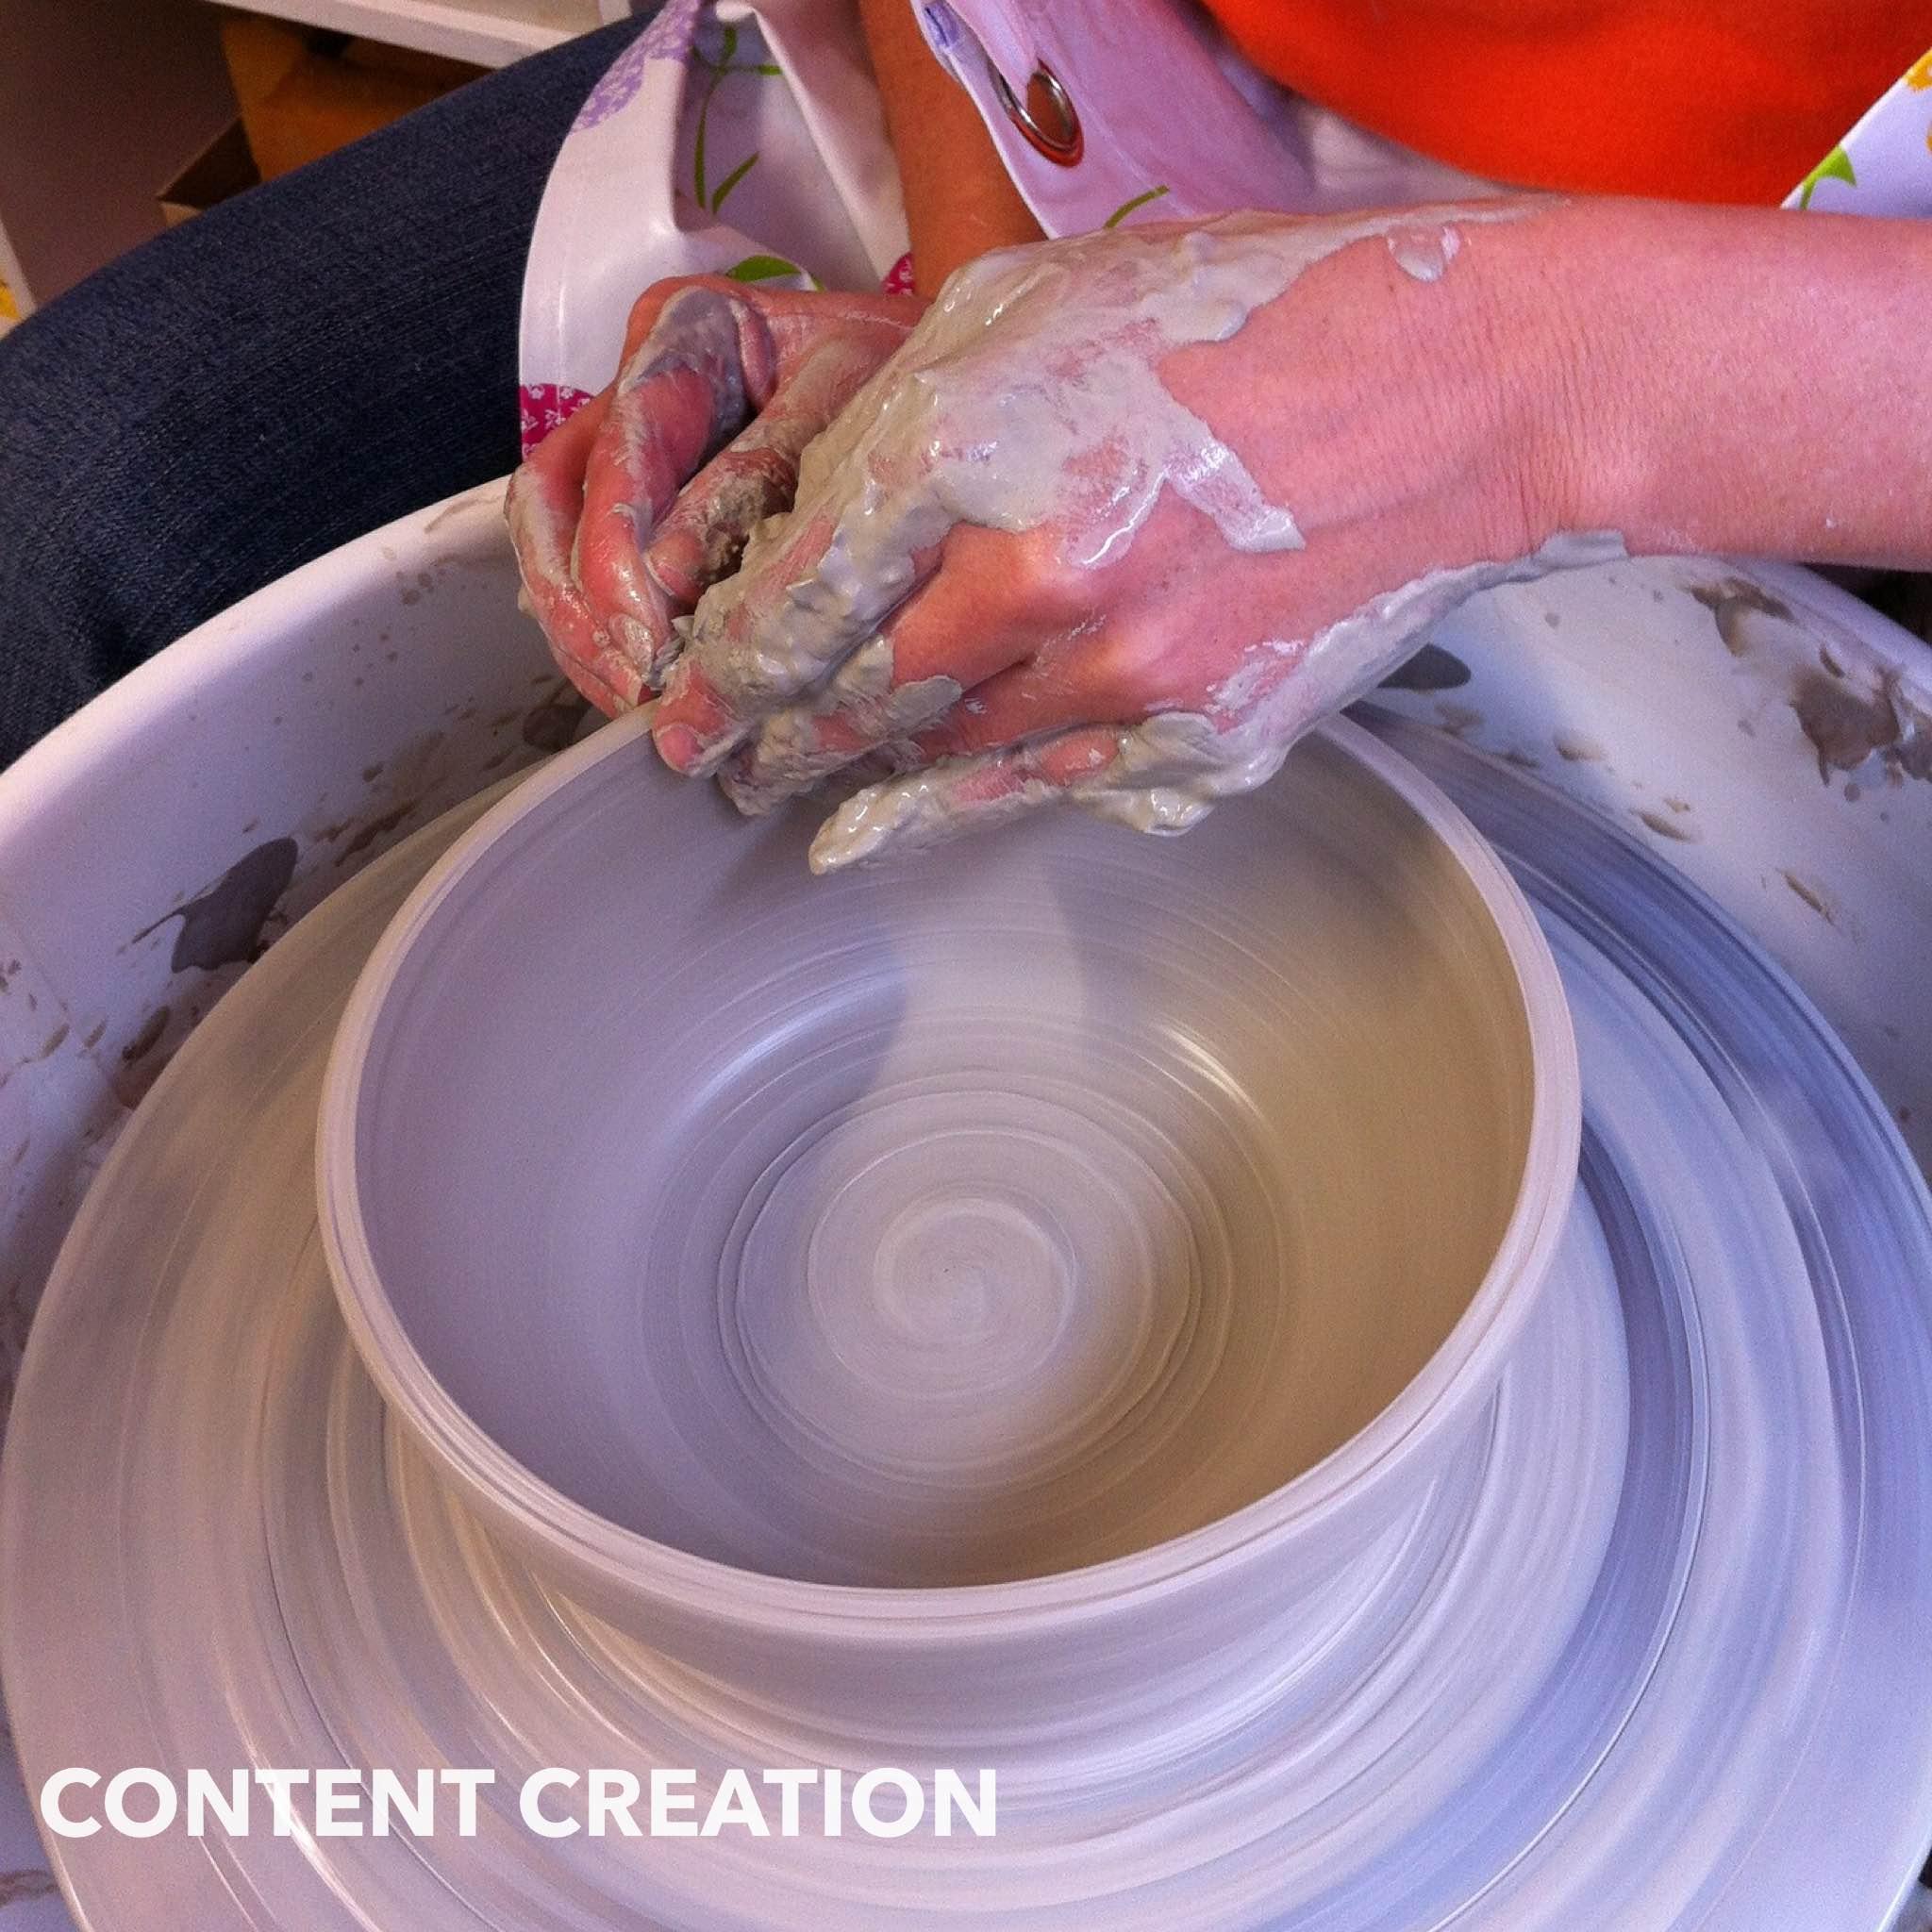 content creation.jpg